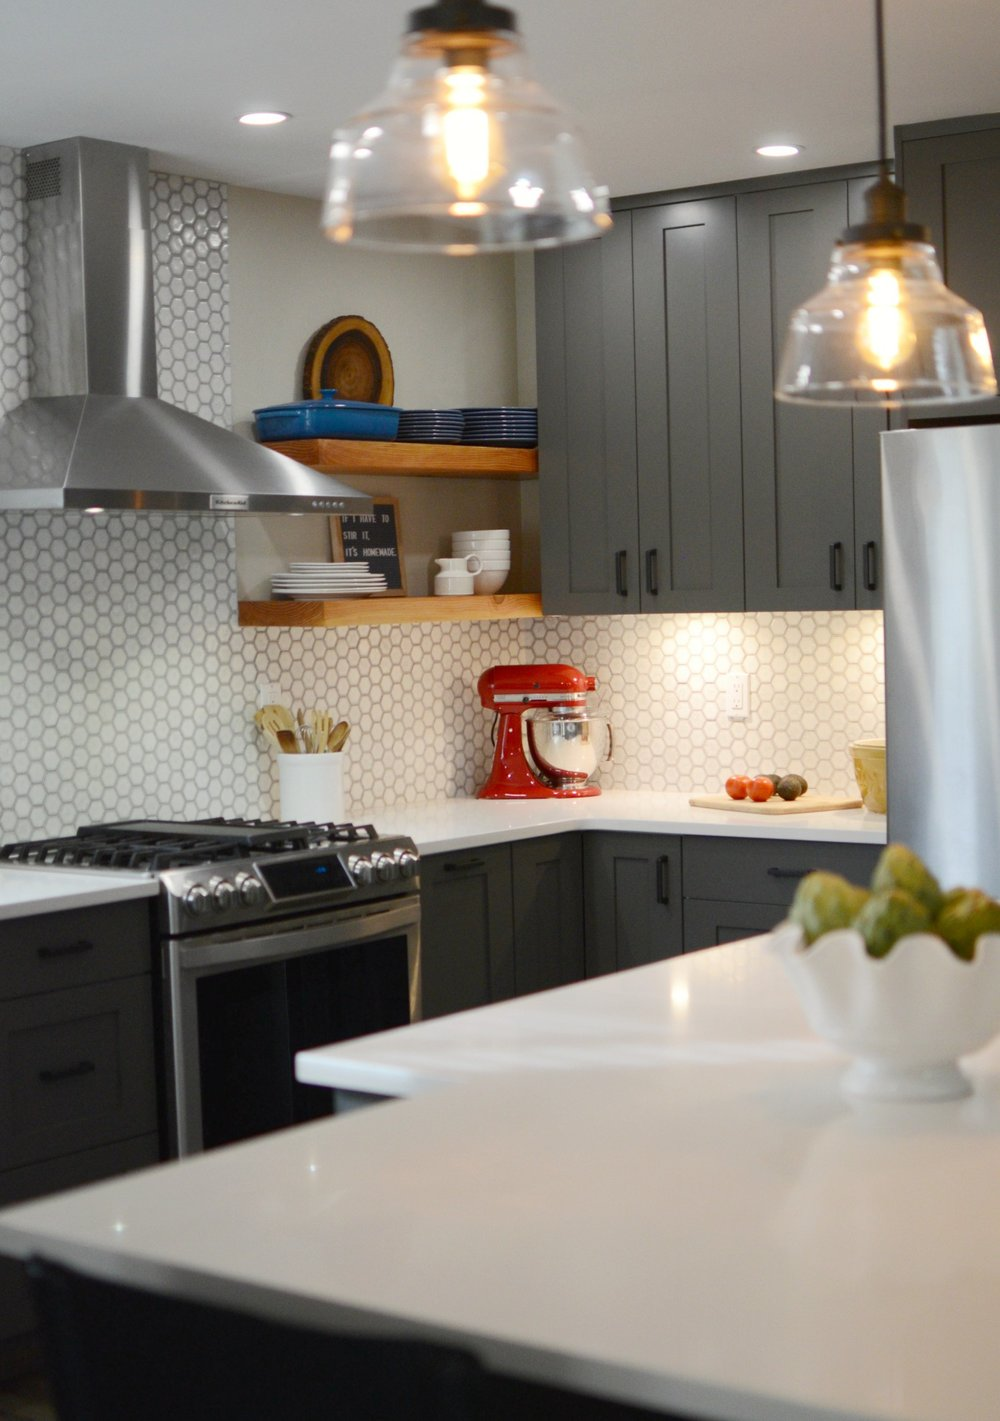 calgary-interior-design-kitchen-renovation-modern-farmhouse-7.jpg